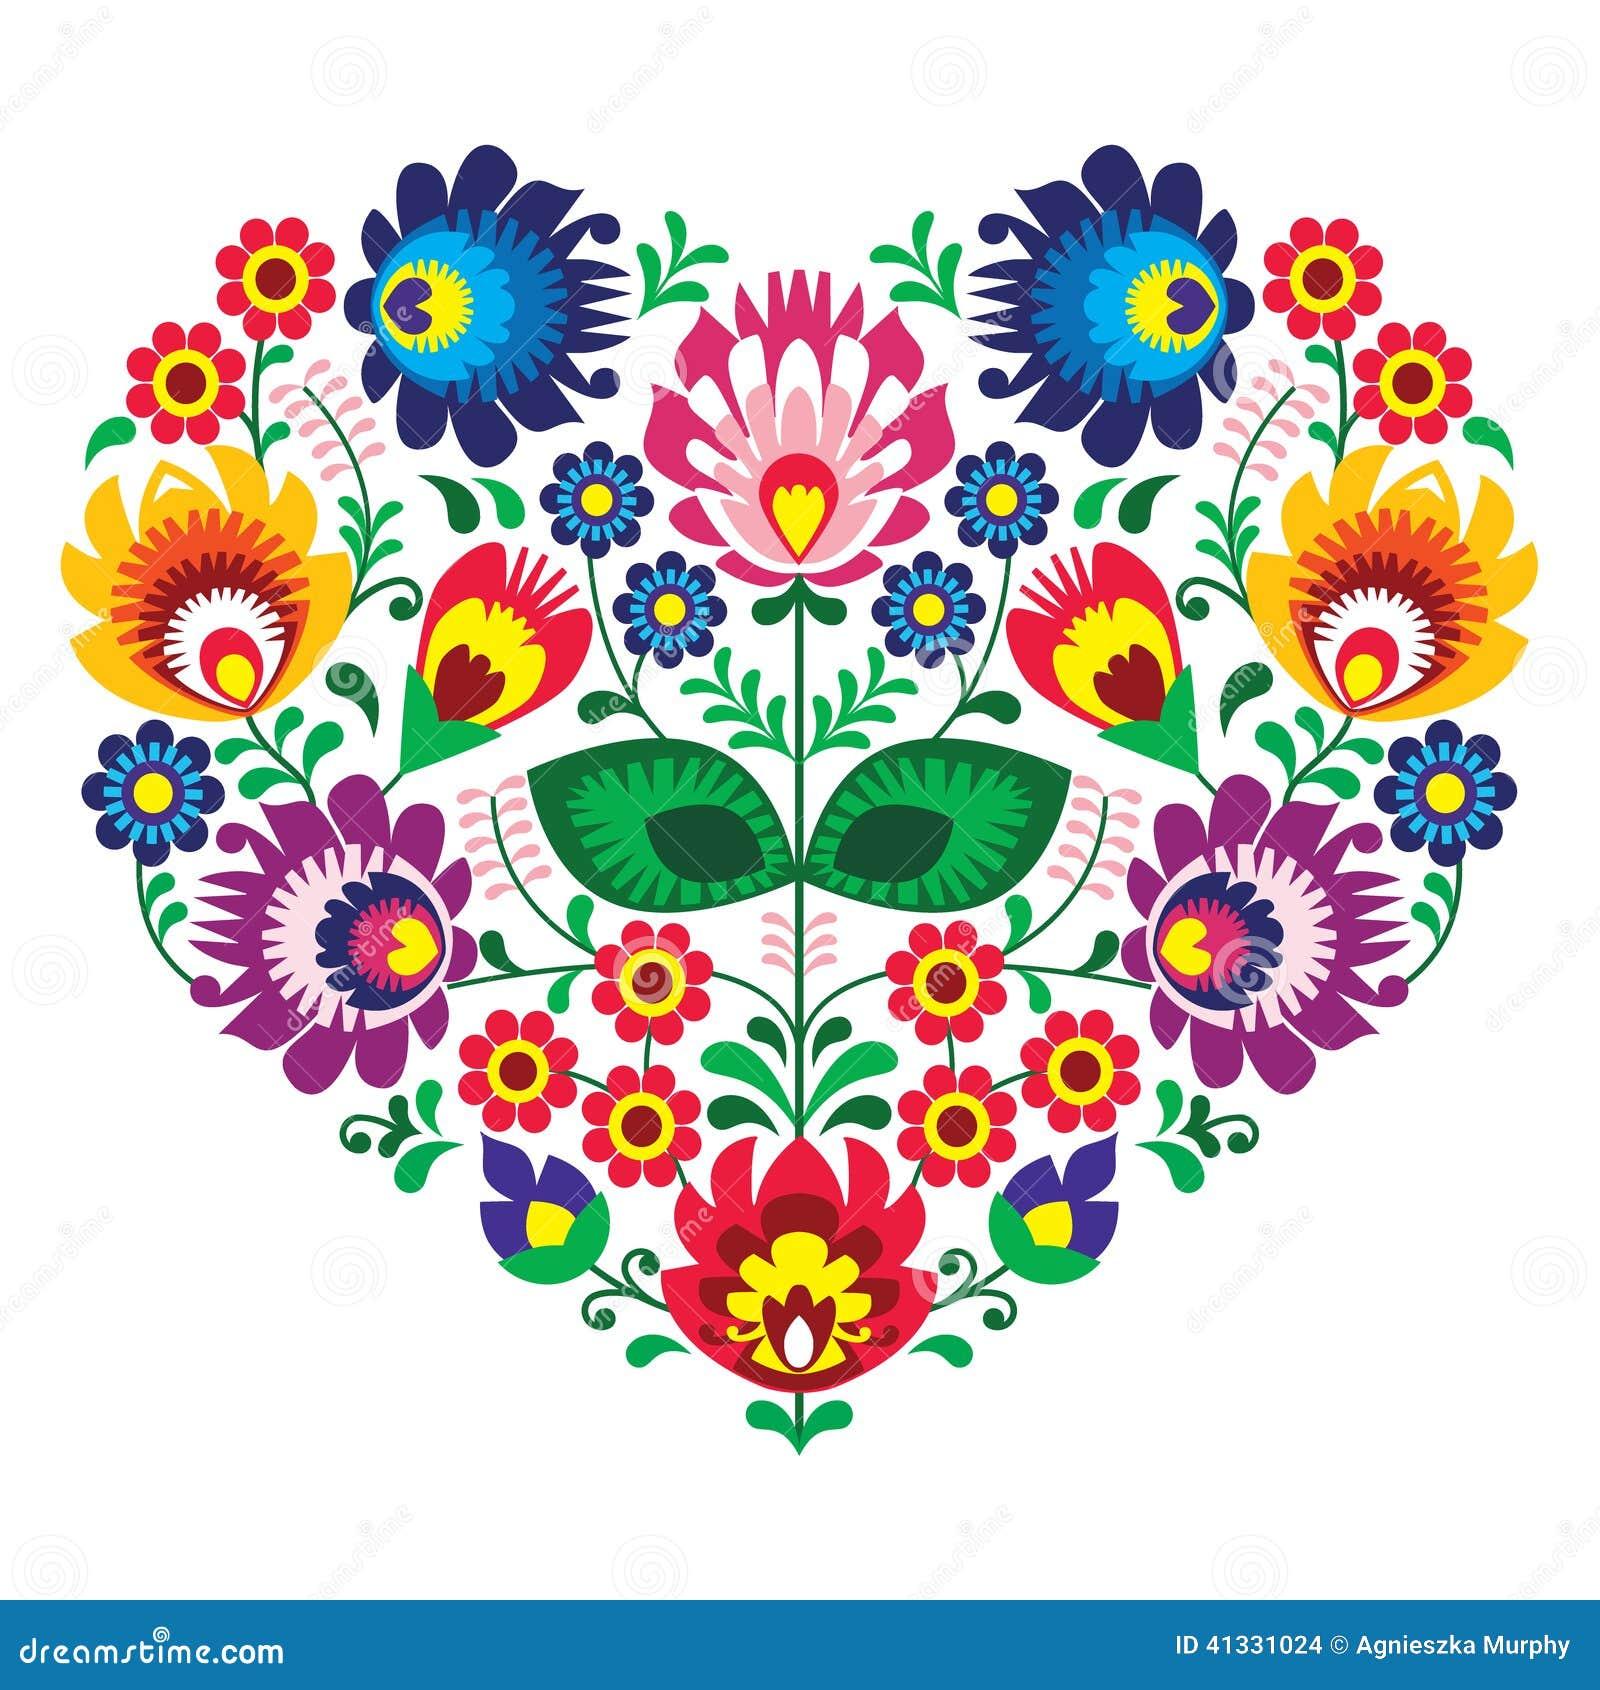 Polish olk art art heart embroidery with flowers - wzory lowickie